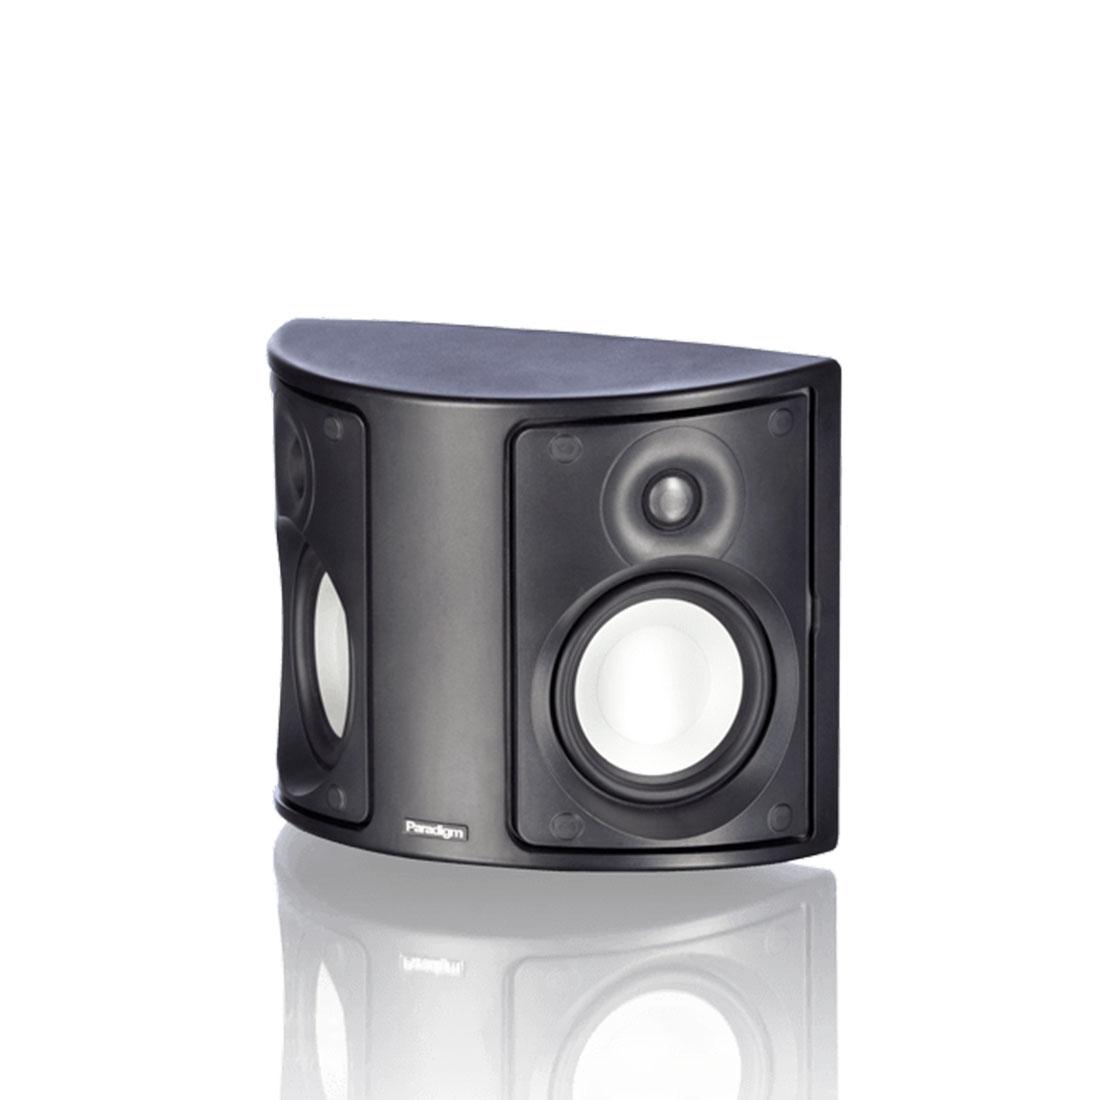 marantz sr5011 7 2 av receiver b stock paradigm monitor 9 floor speakers monitor center 3. Black Bedroom Furniture Sets. Home Design Ideas